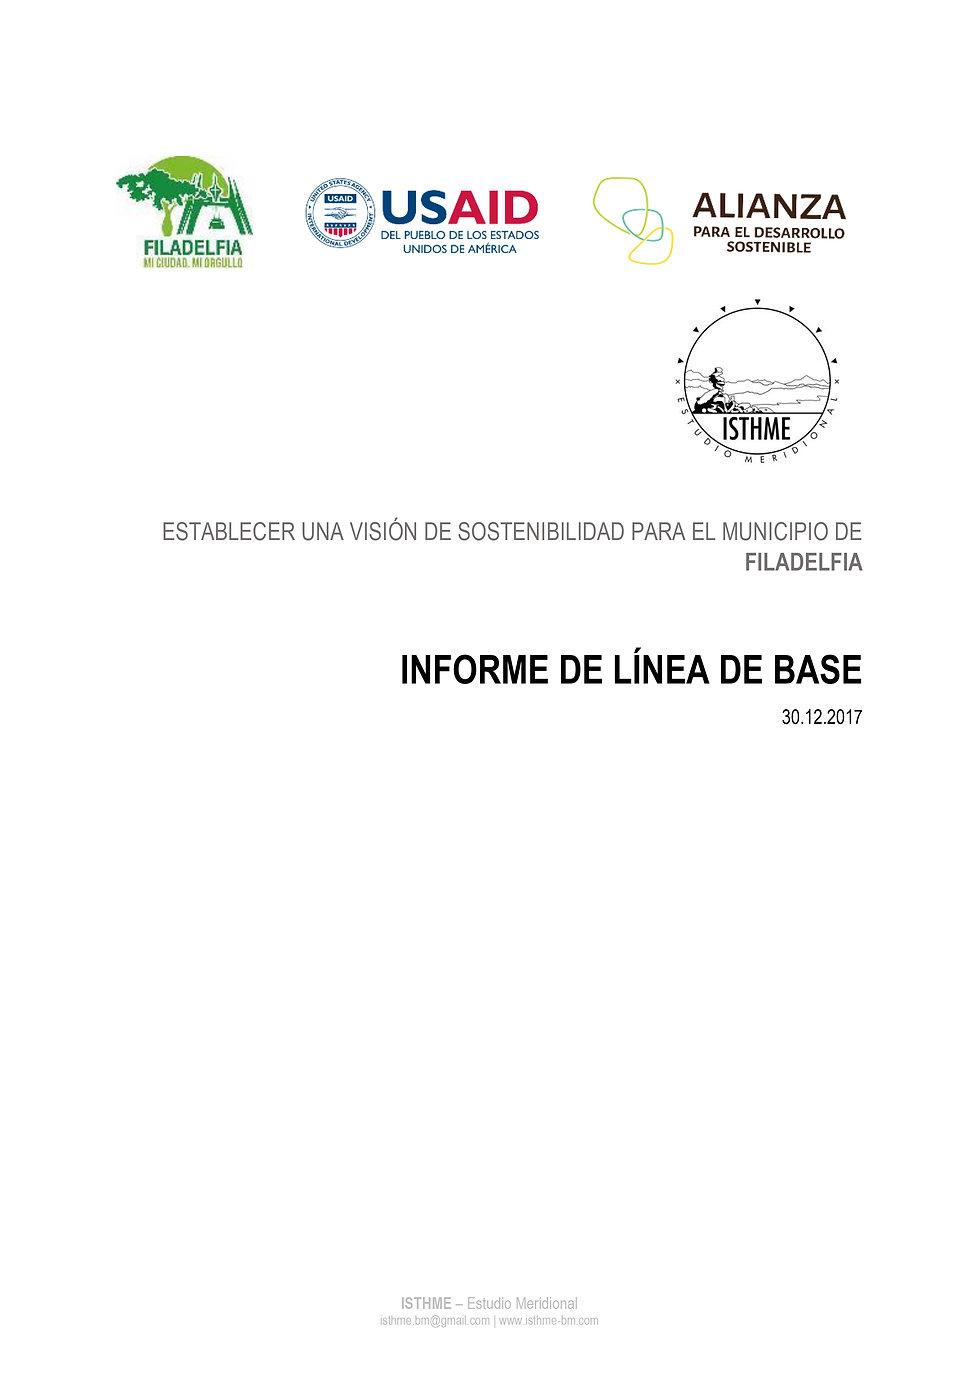 INV07a Linea Base FIL.jpg